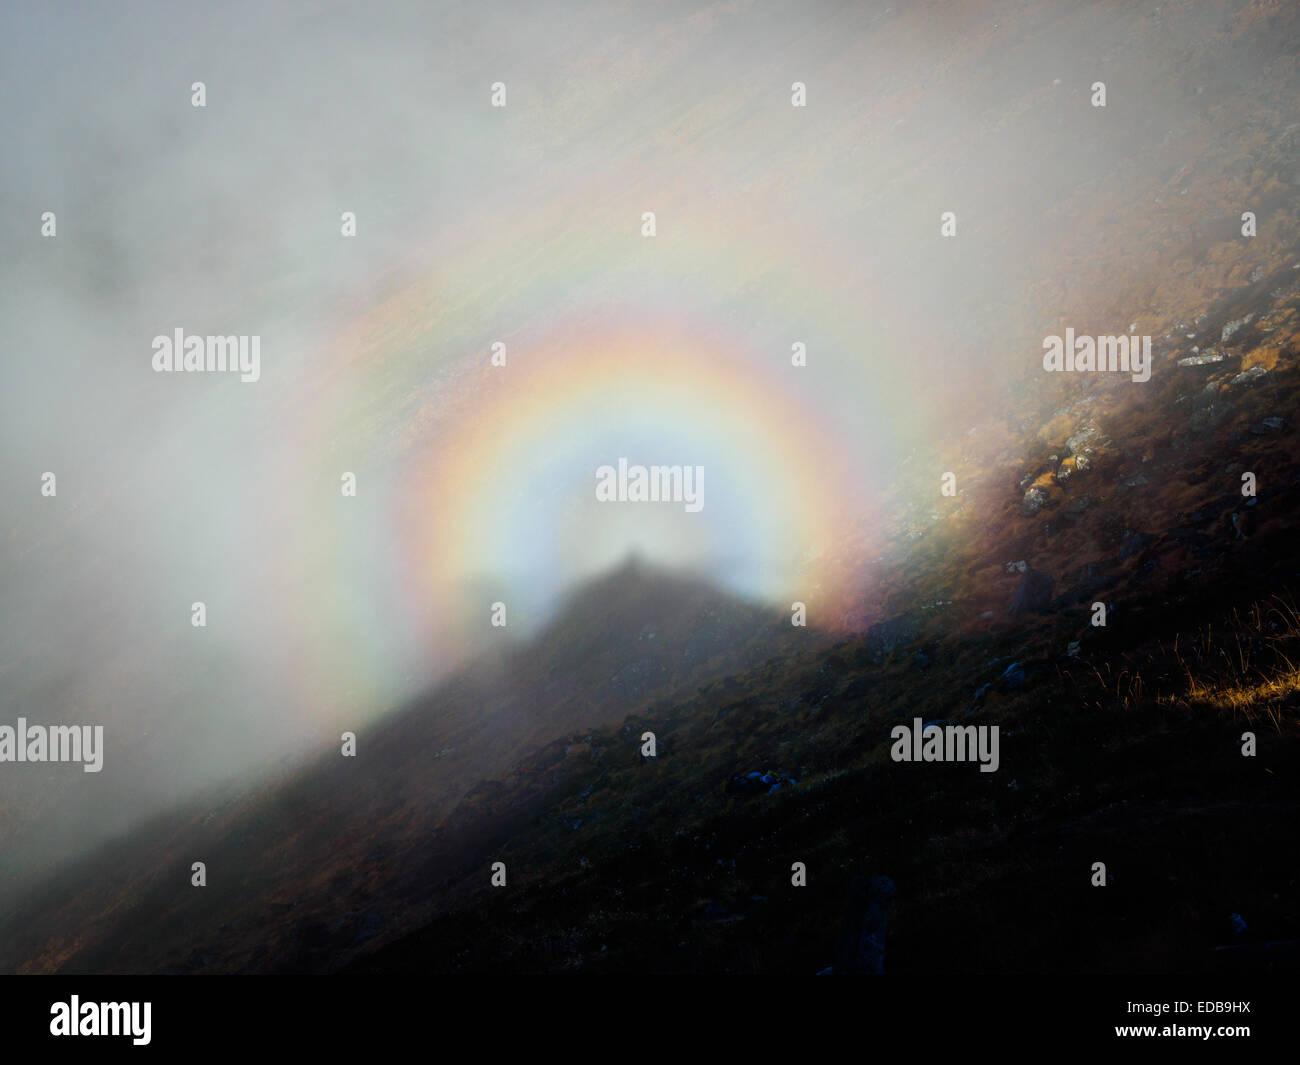 Optical phenomenon of 'glory' or 'Buddha's light' in the Nepal Himalaya - Stock Image